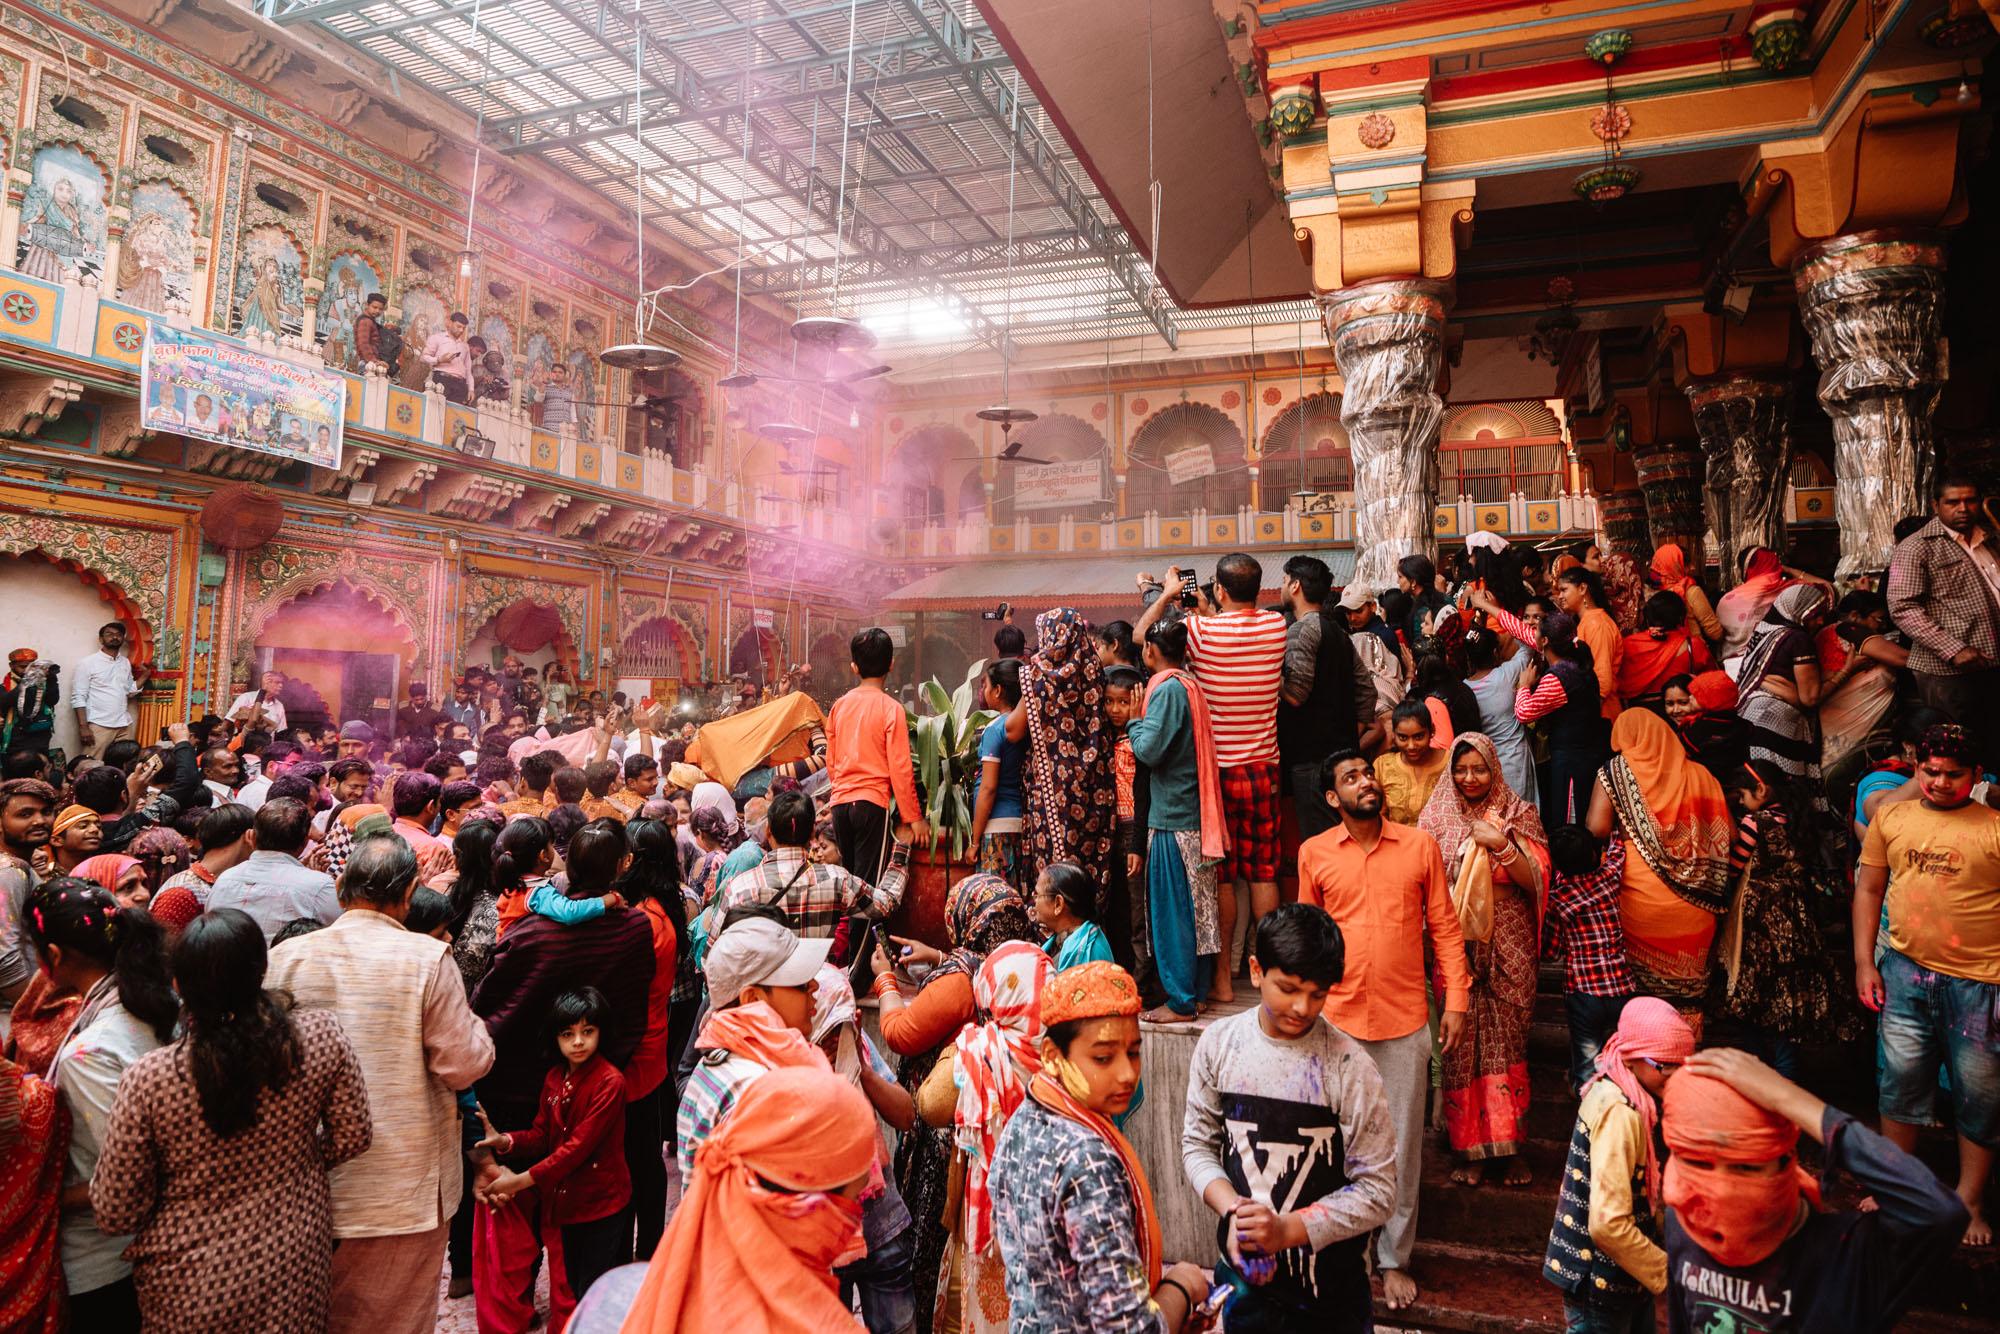 People celebrating Holi Festival in Dwarkadhish Temple in Mathura, India